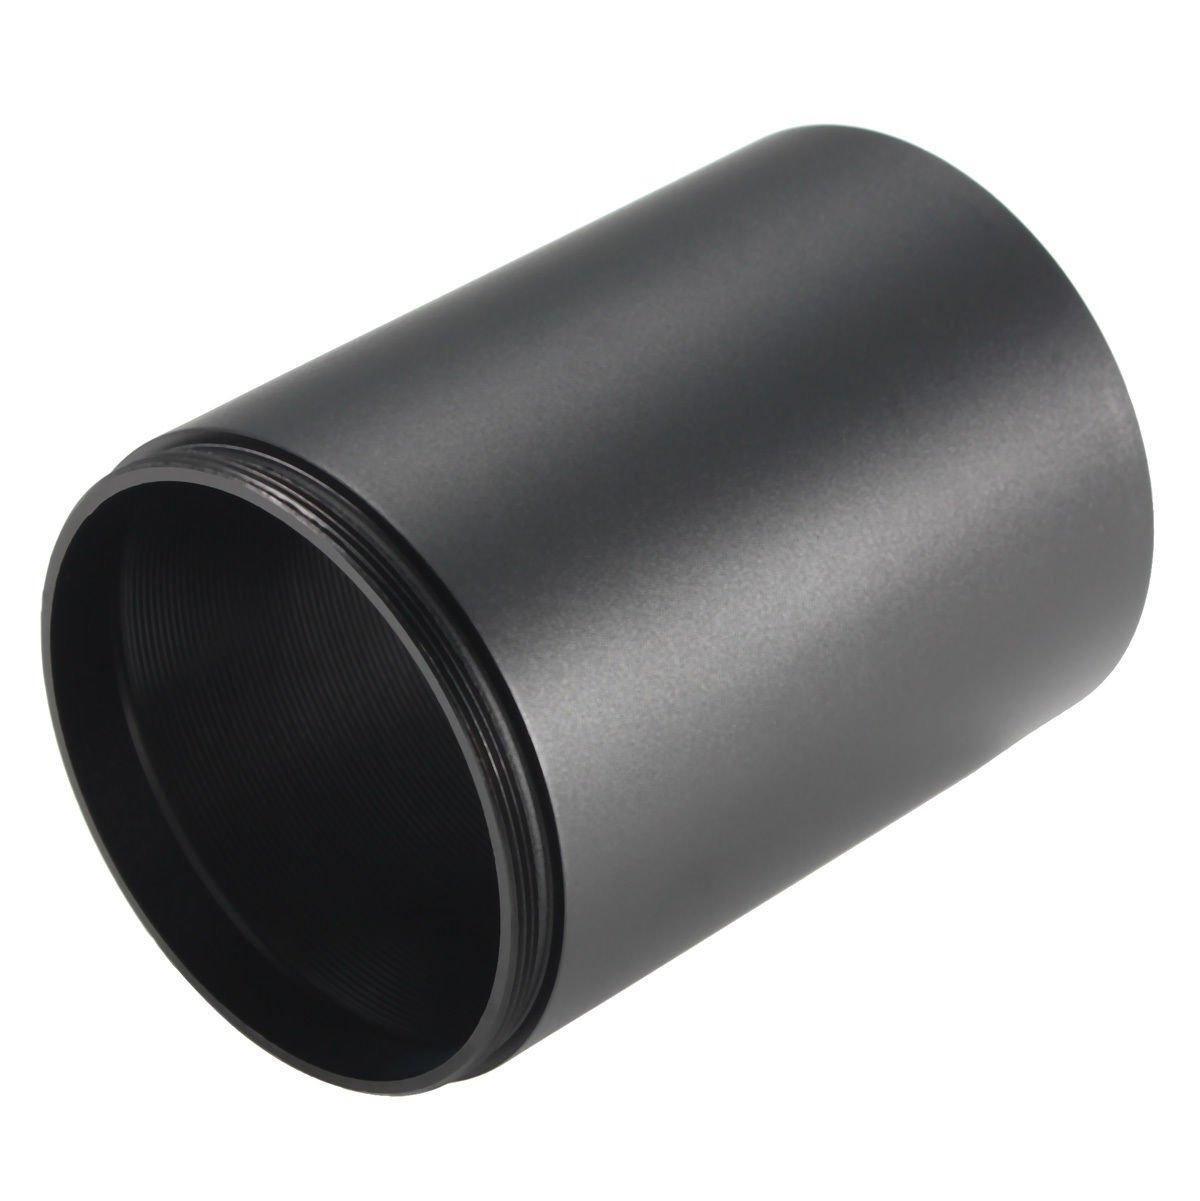 Generic dyhp-a10-code-5840-class-1 -- Alcance 67 parasol mm 3 ¡Å parasol 67 Shade para para S Negro aleación 40 mm su avanzada fibra nced táctico aleación de 40 mm a – -dyhp-uk10 – 160819 – 3802 68e5f0